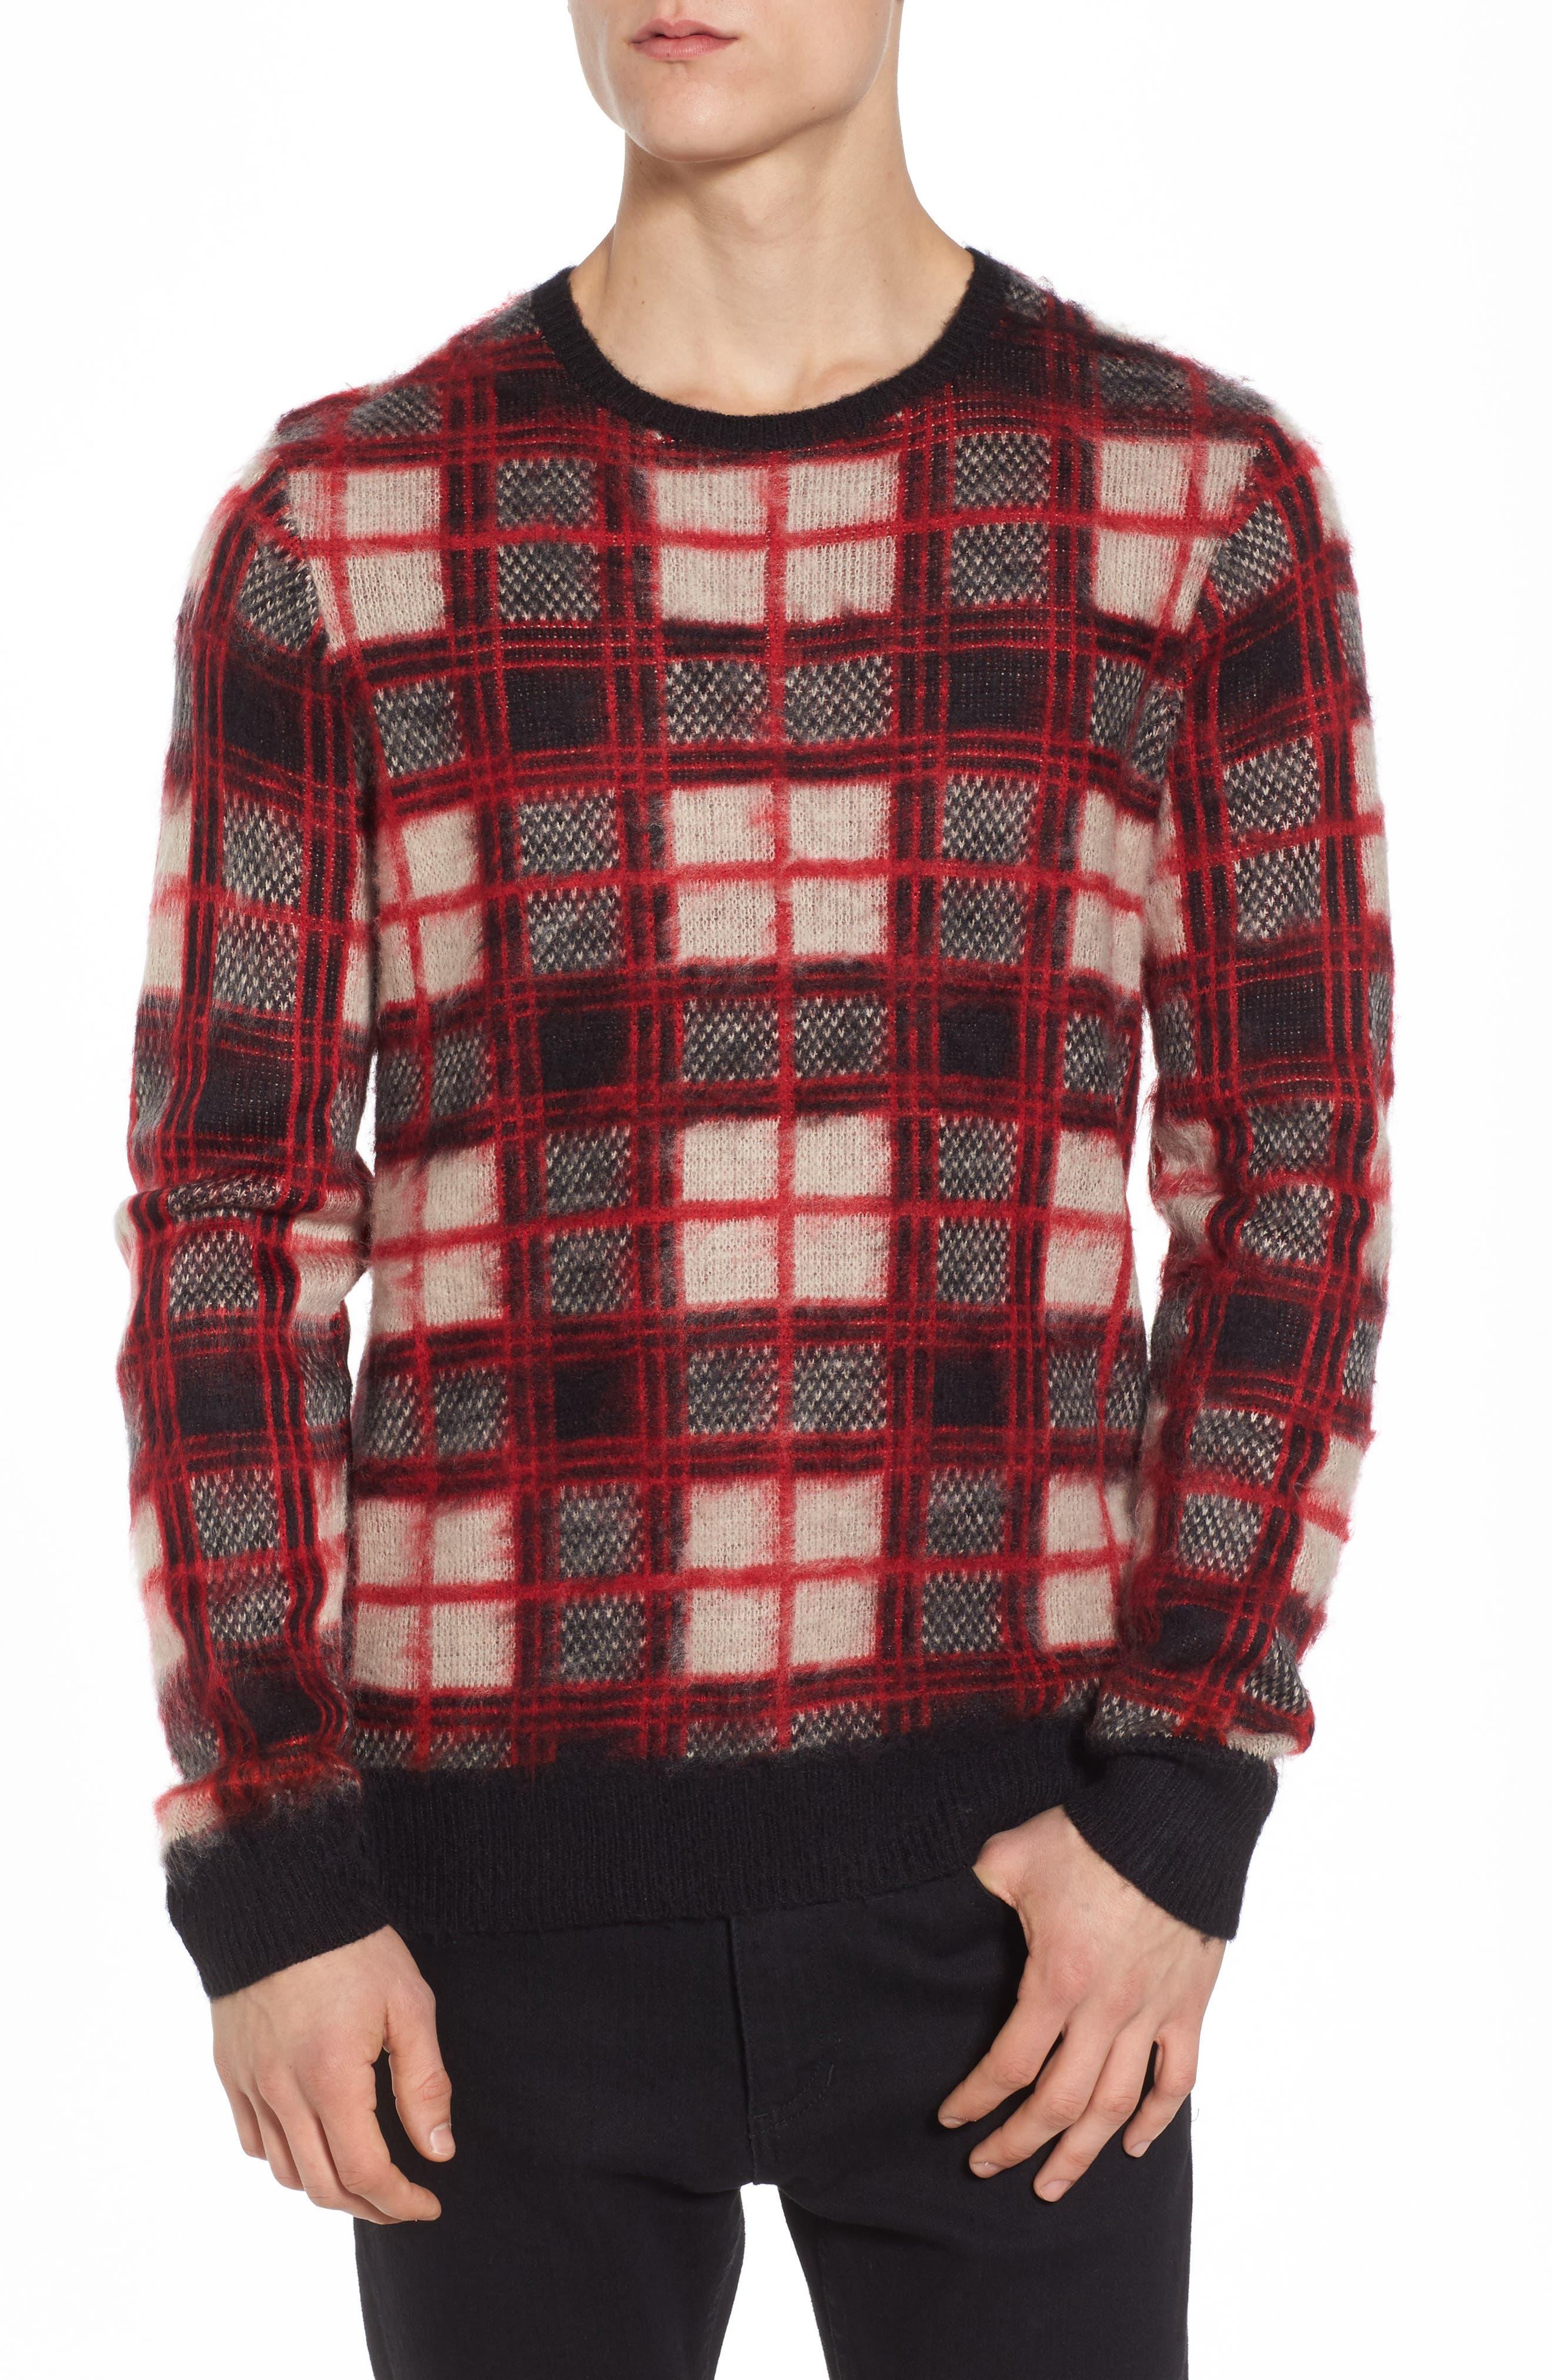 The Rail Fuzzy Plaid Sweater